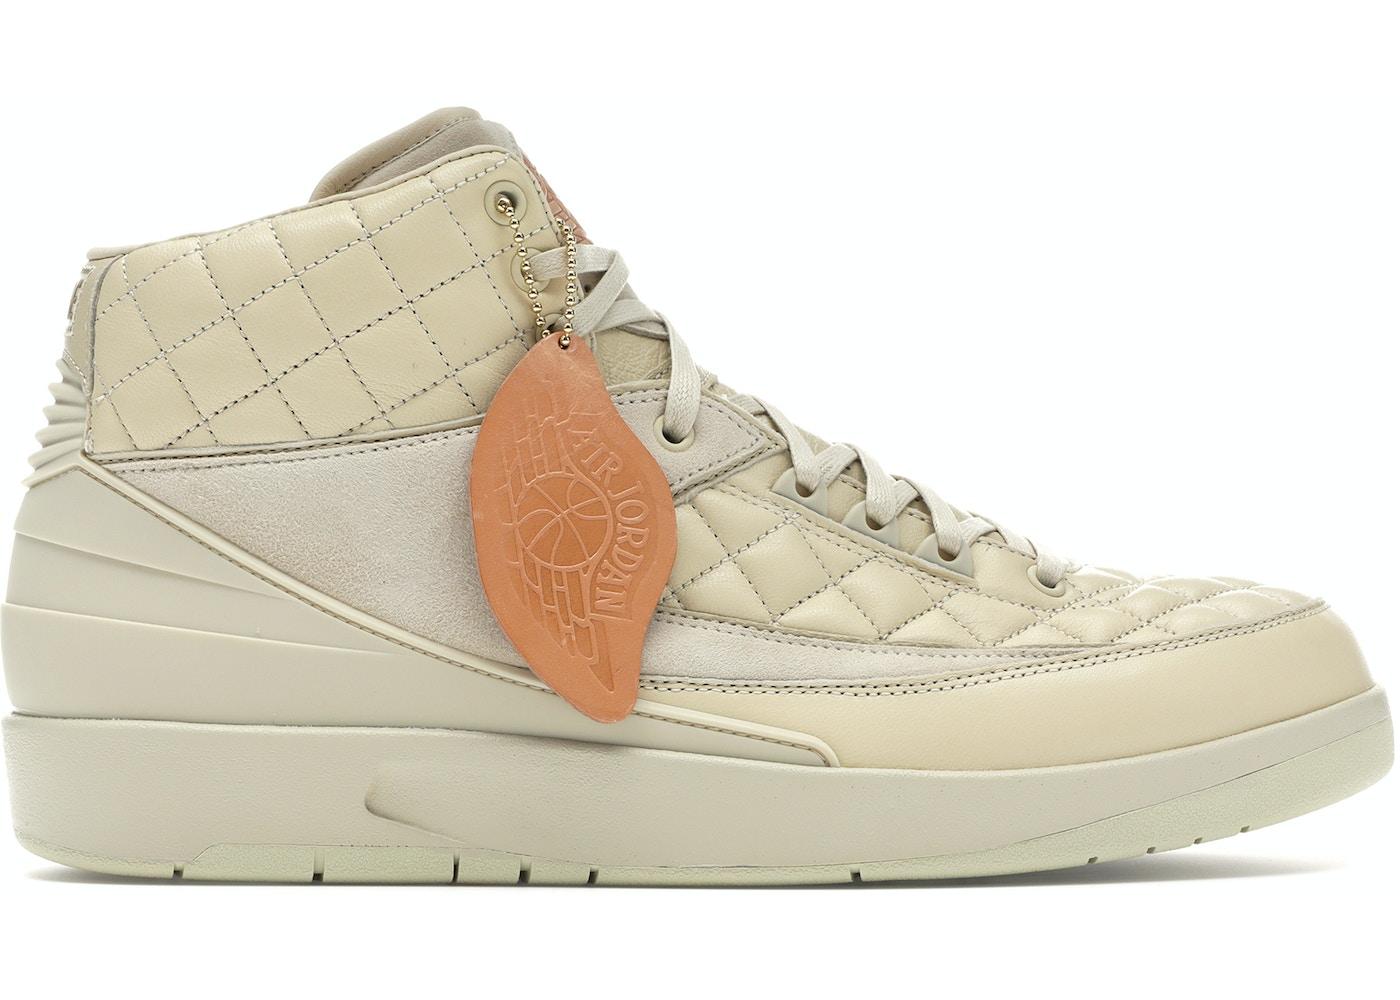 new styles 6cbe1 34d52 Jordan 2 Retro Just Don Beach - 834825-250